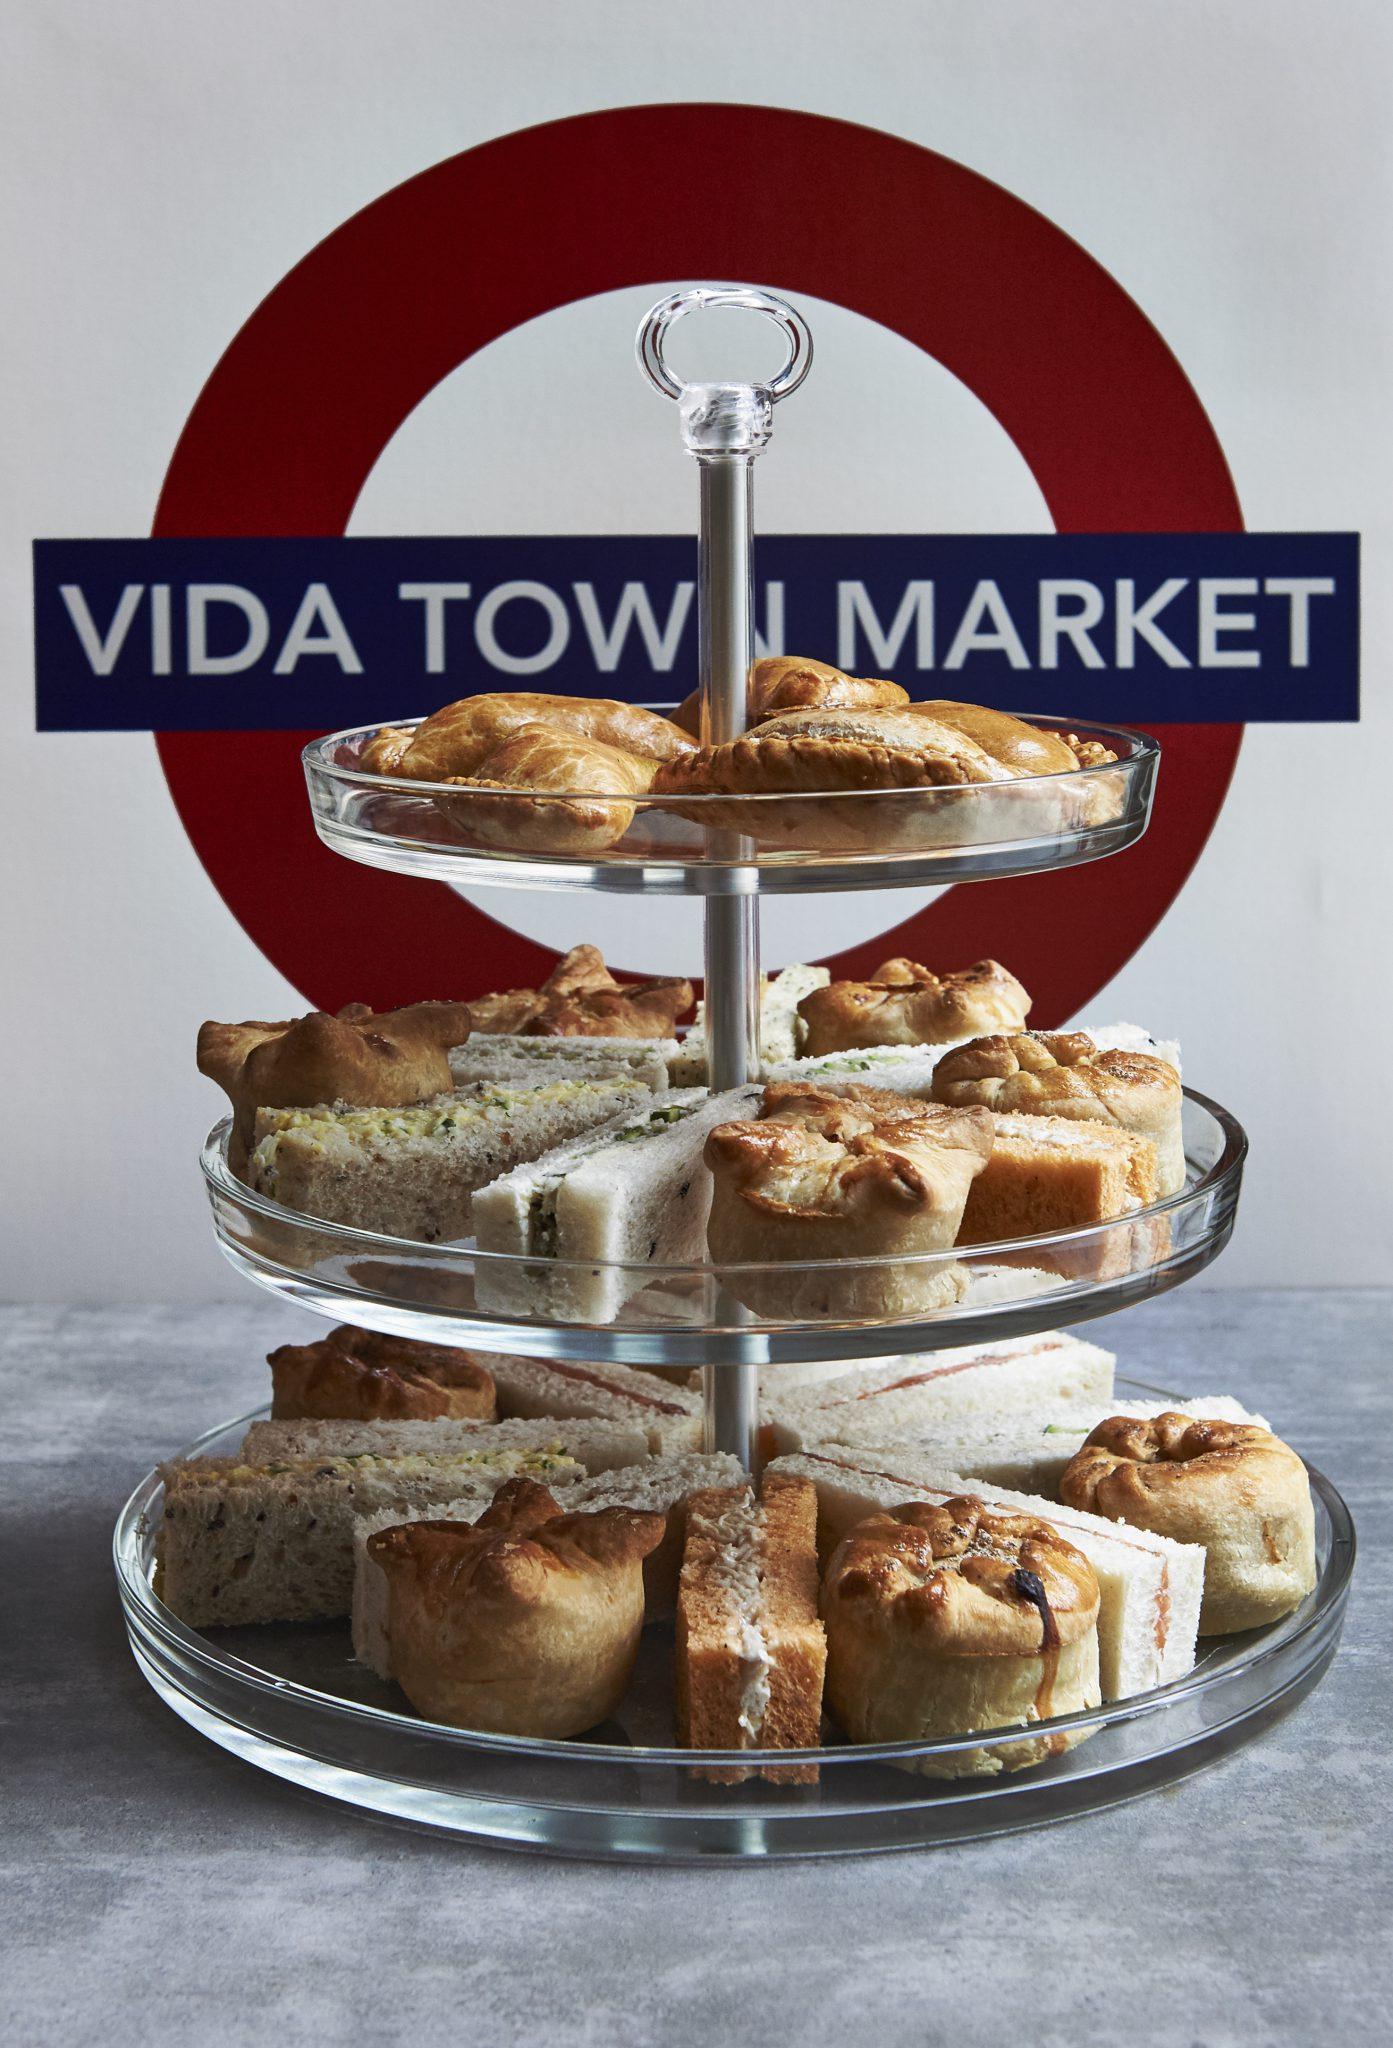 Vida Downtown-Urban Picnic-Best of The Brits-3bis